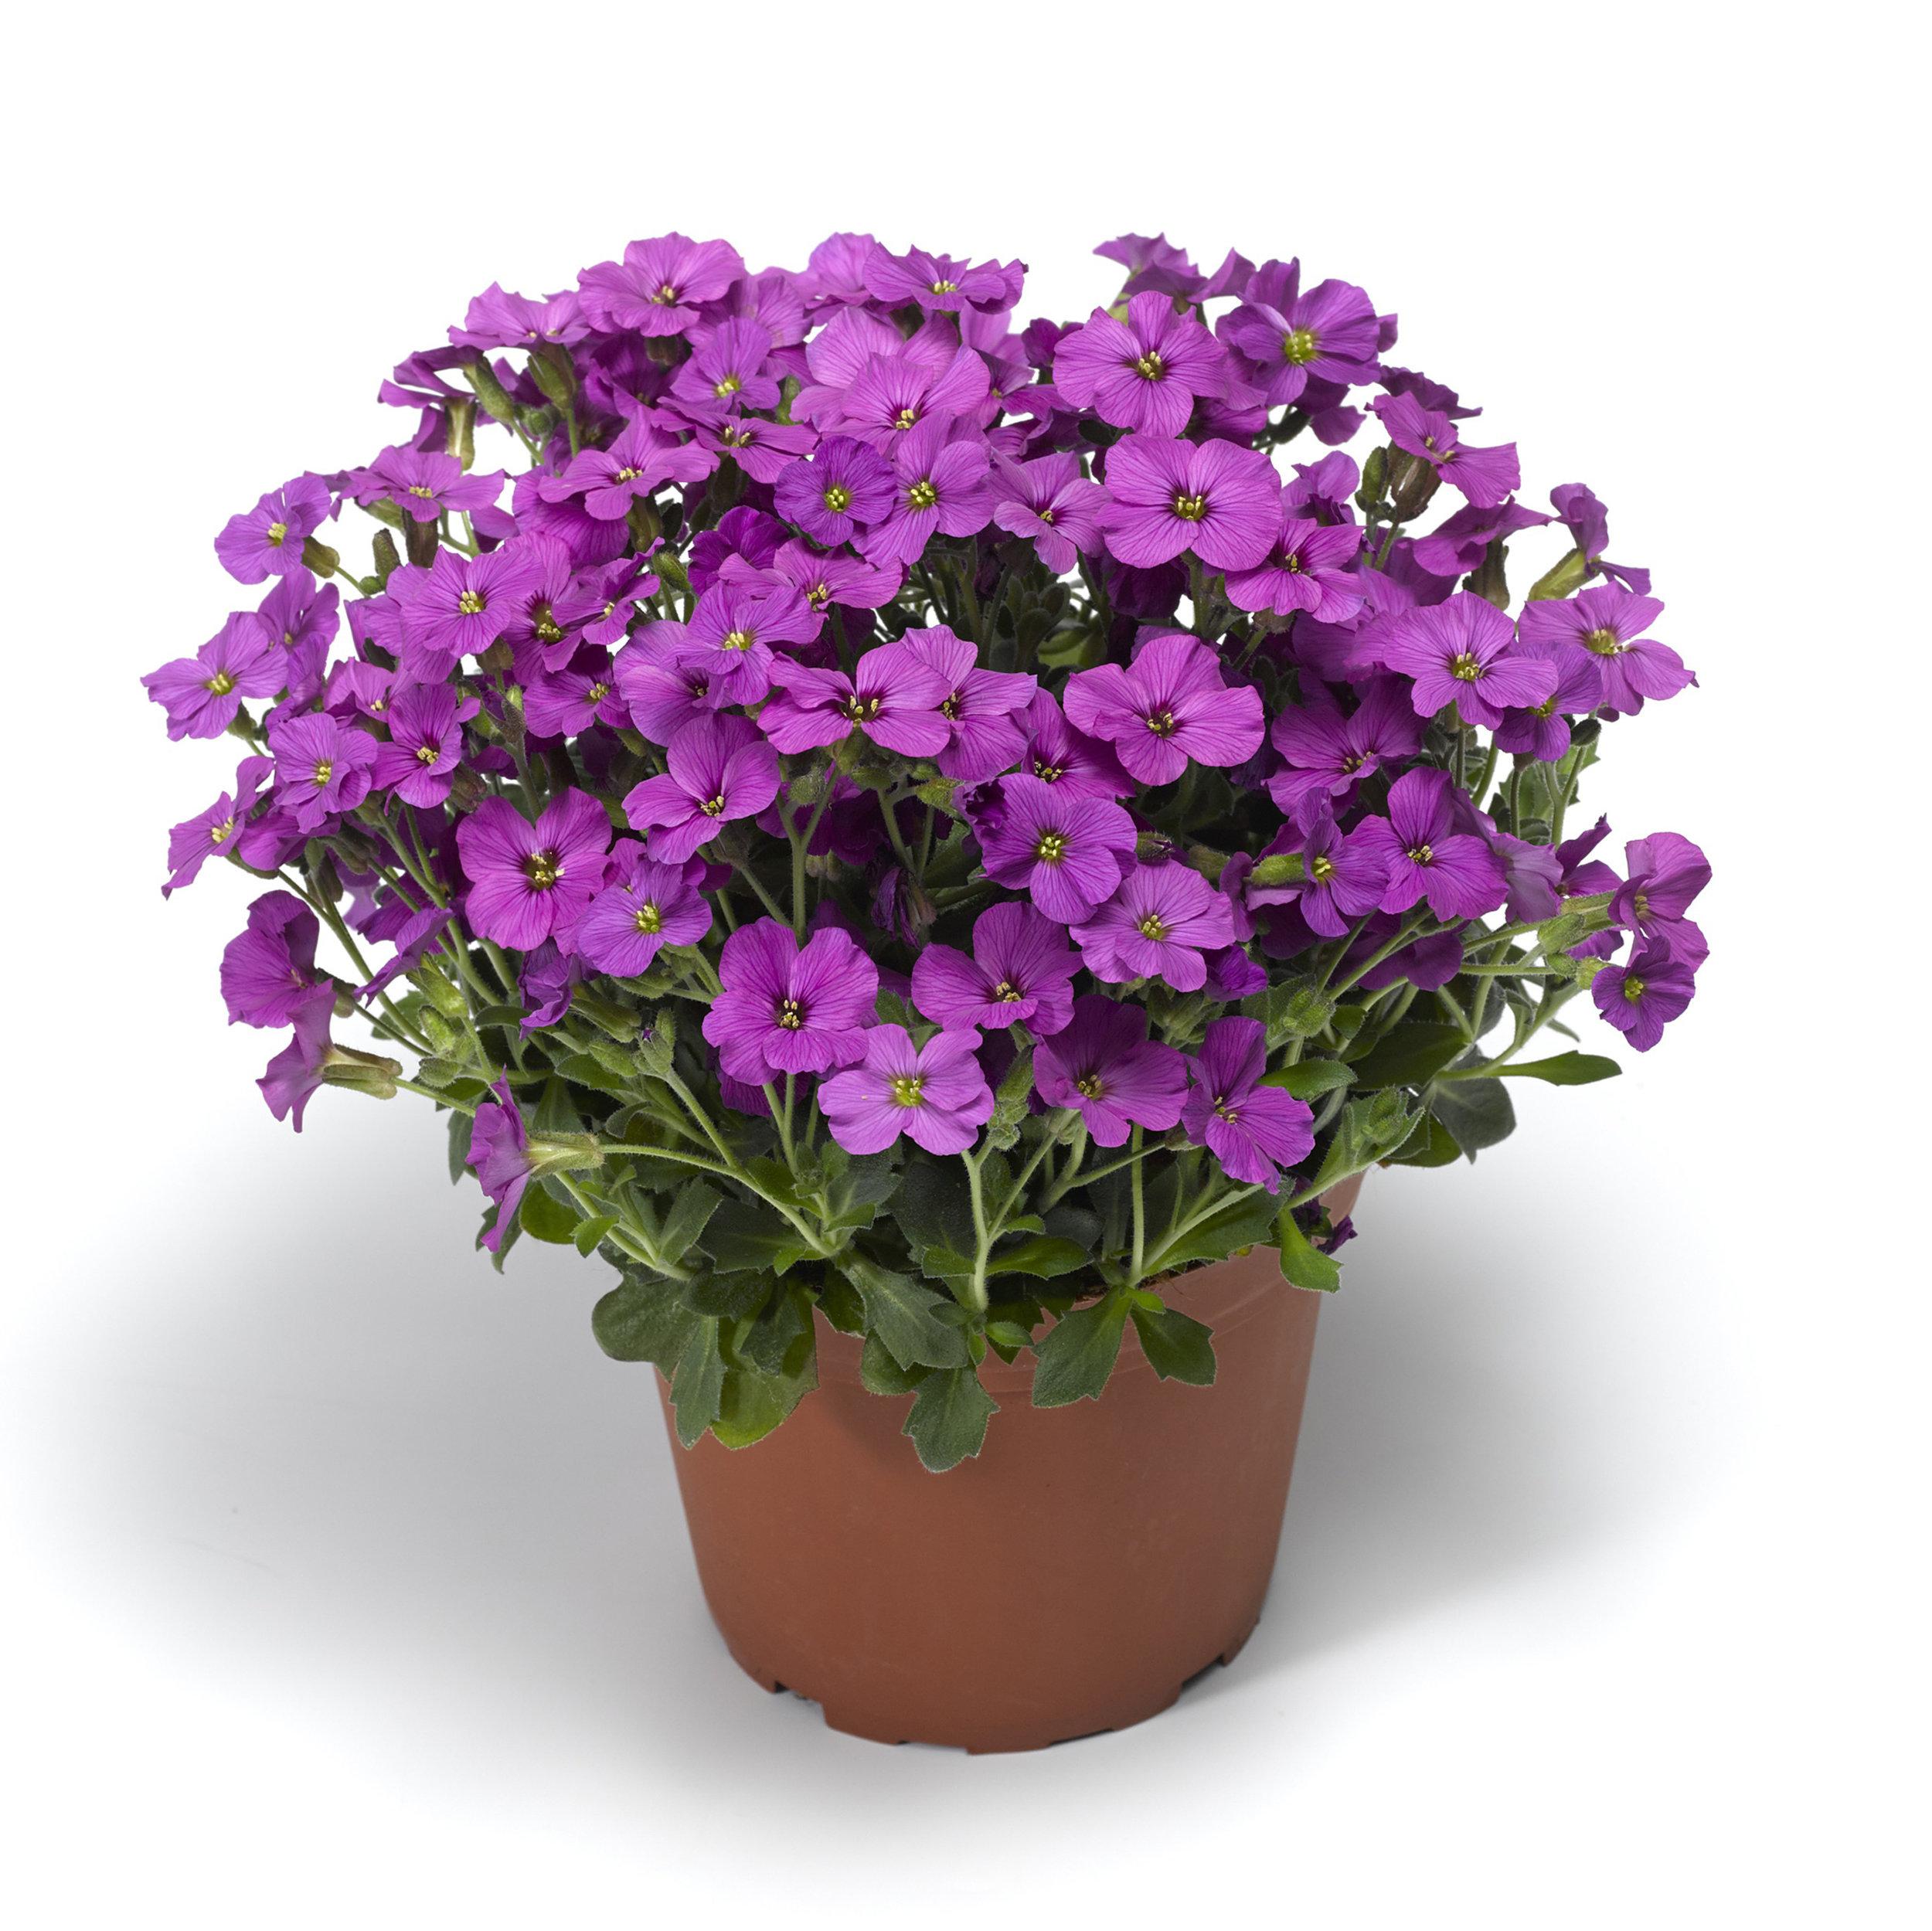 HR_Vegetative_Aubrieta_Axcent™_Axcent™_Antique_Rose_70052170_1.jpg